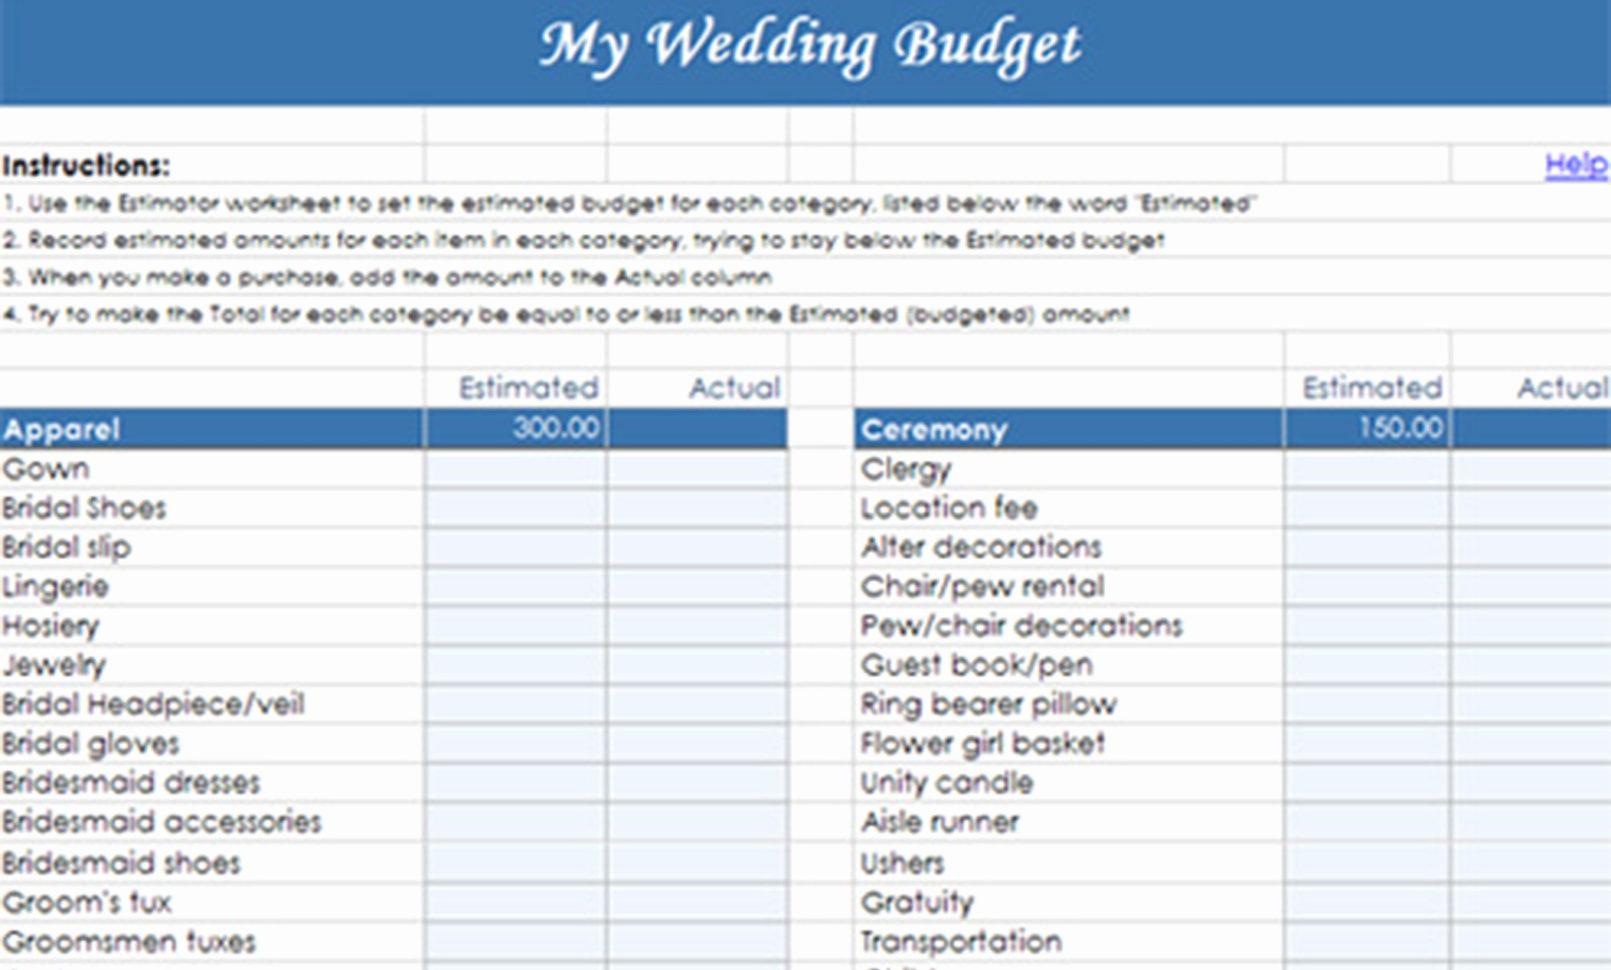 Sample Wedding Budget Spreadsheet Easy Excel Template Savvy To Sample Wedding Budget Spreadsheet